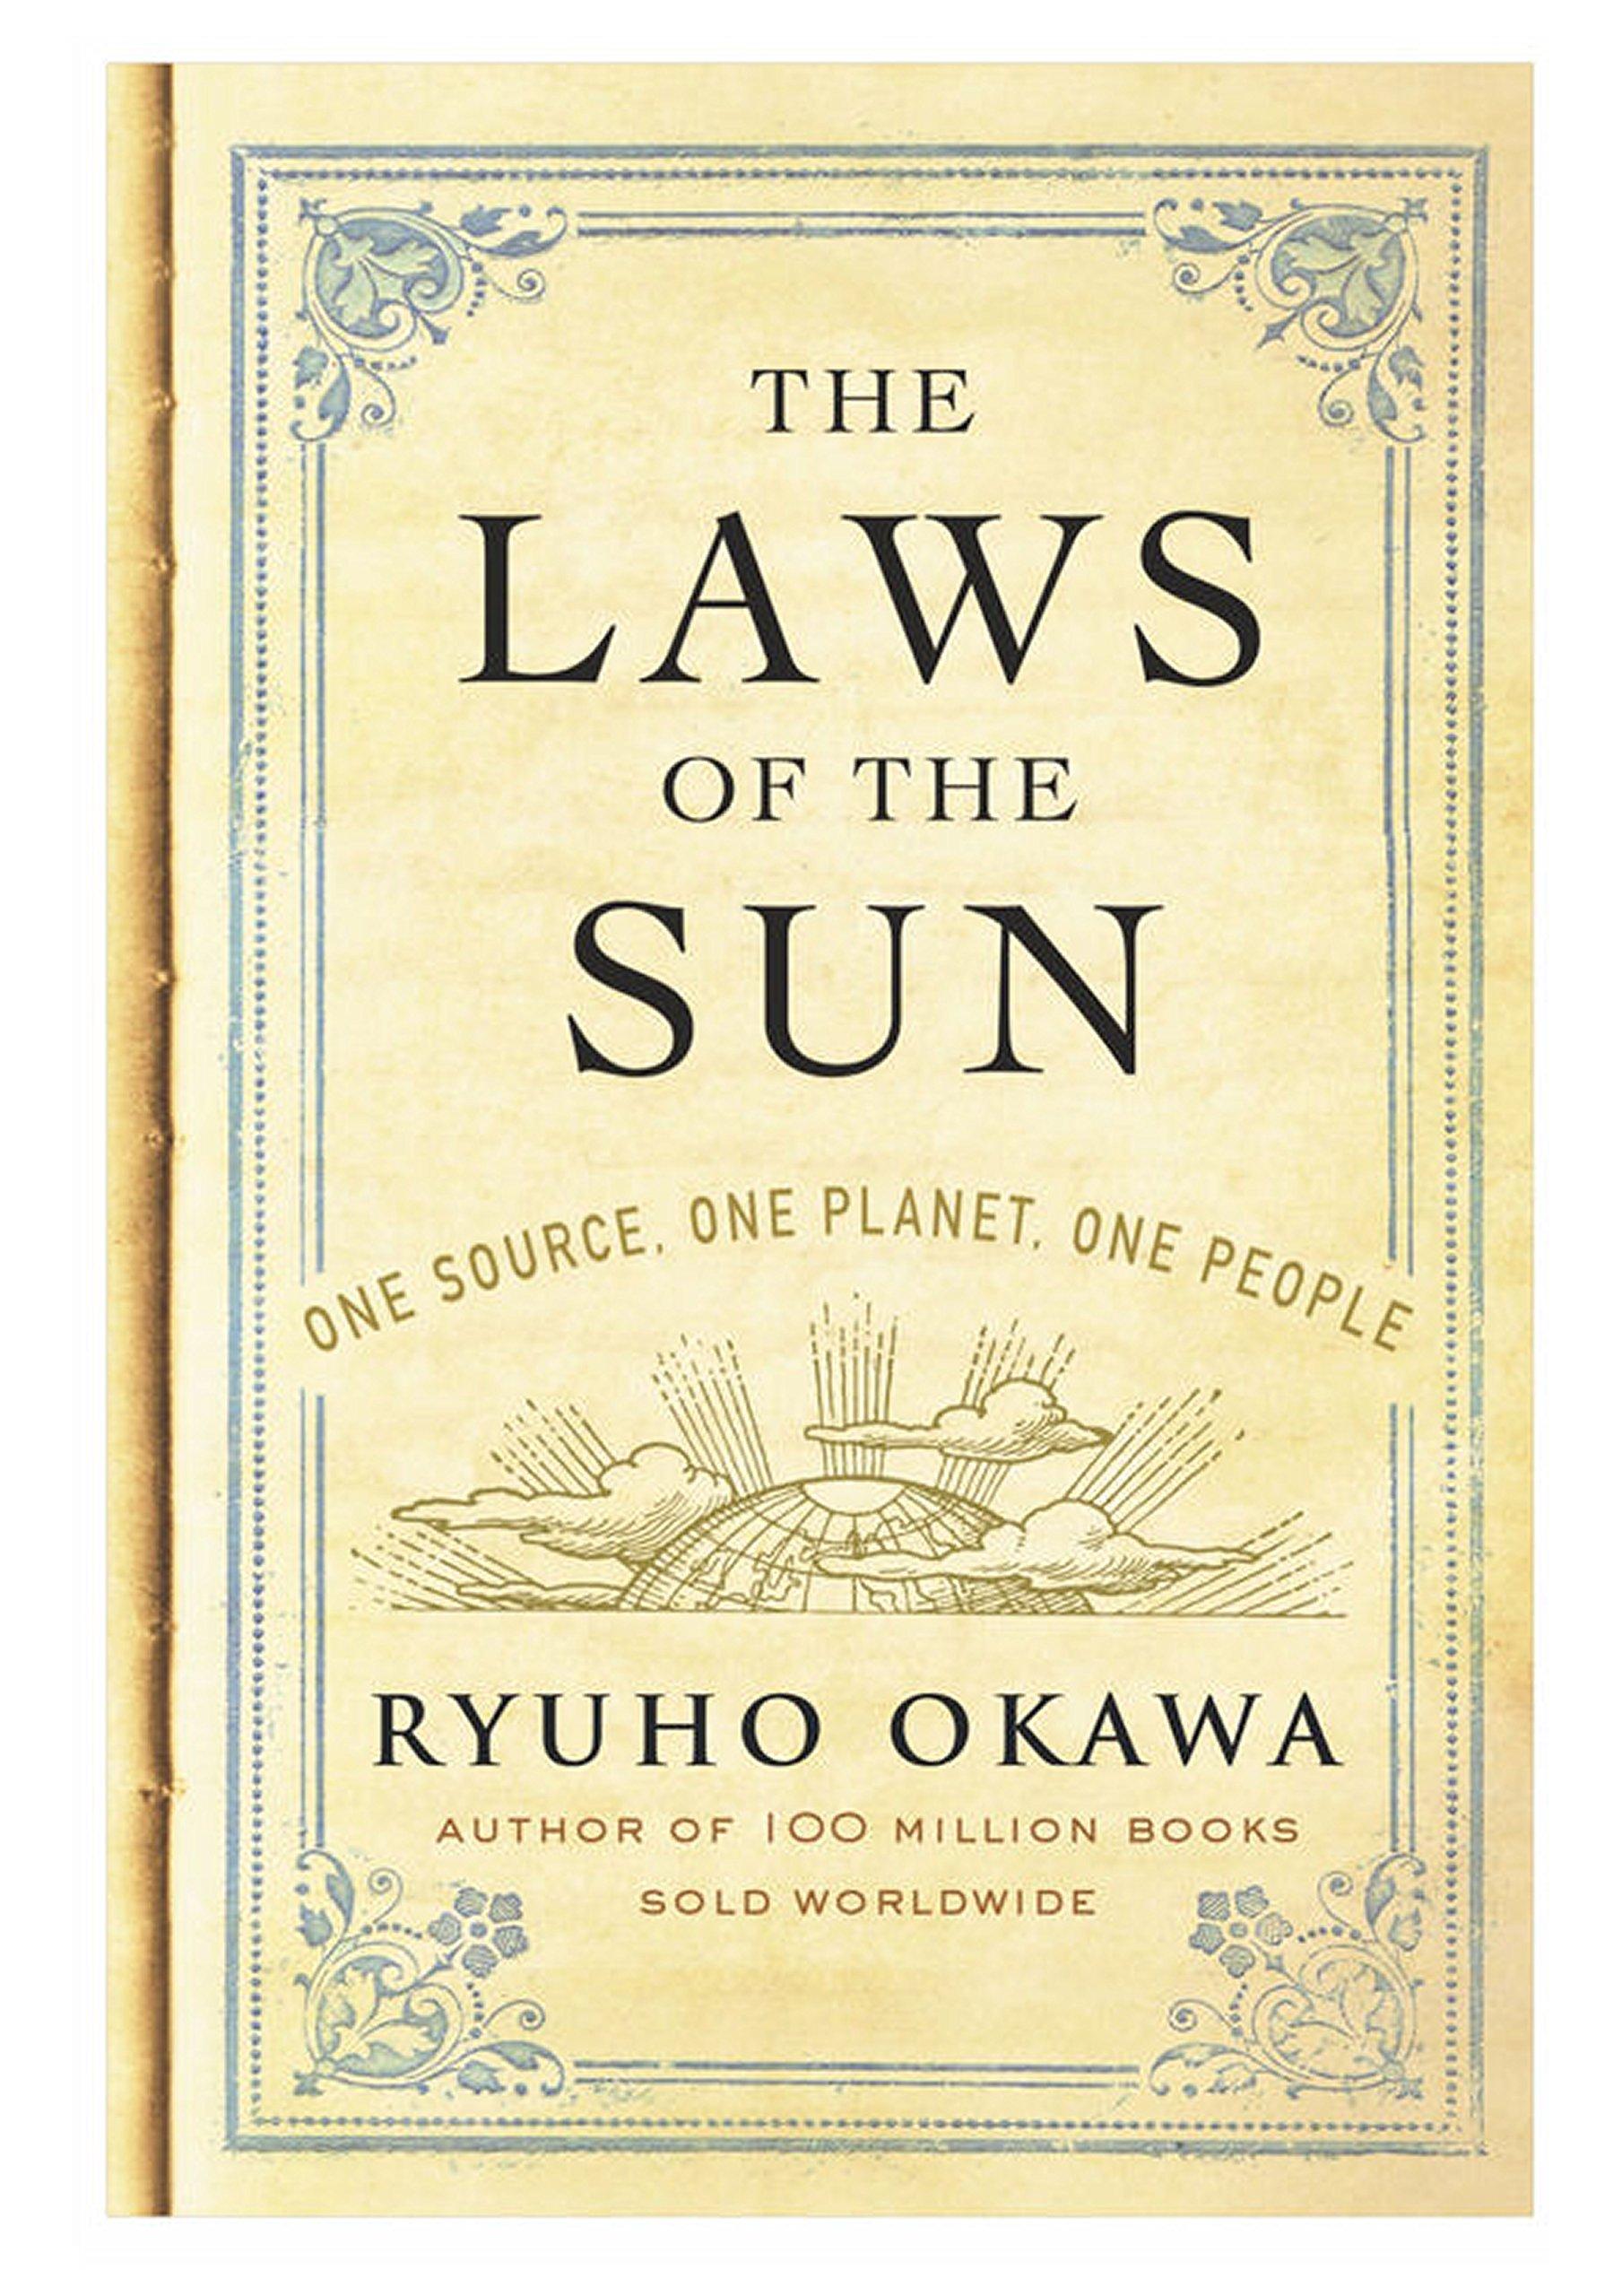 The Laws of The Sun: One Source, One Planet, One People: Ryuho Okawa:  9781942125433: Amazon.com: Books